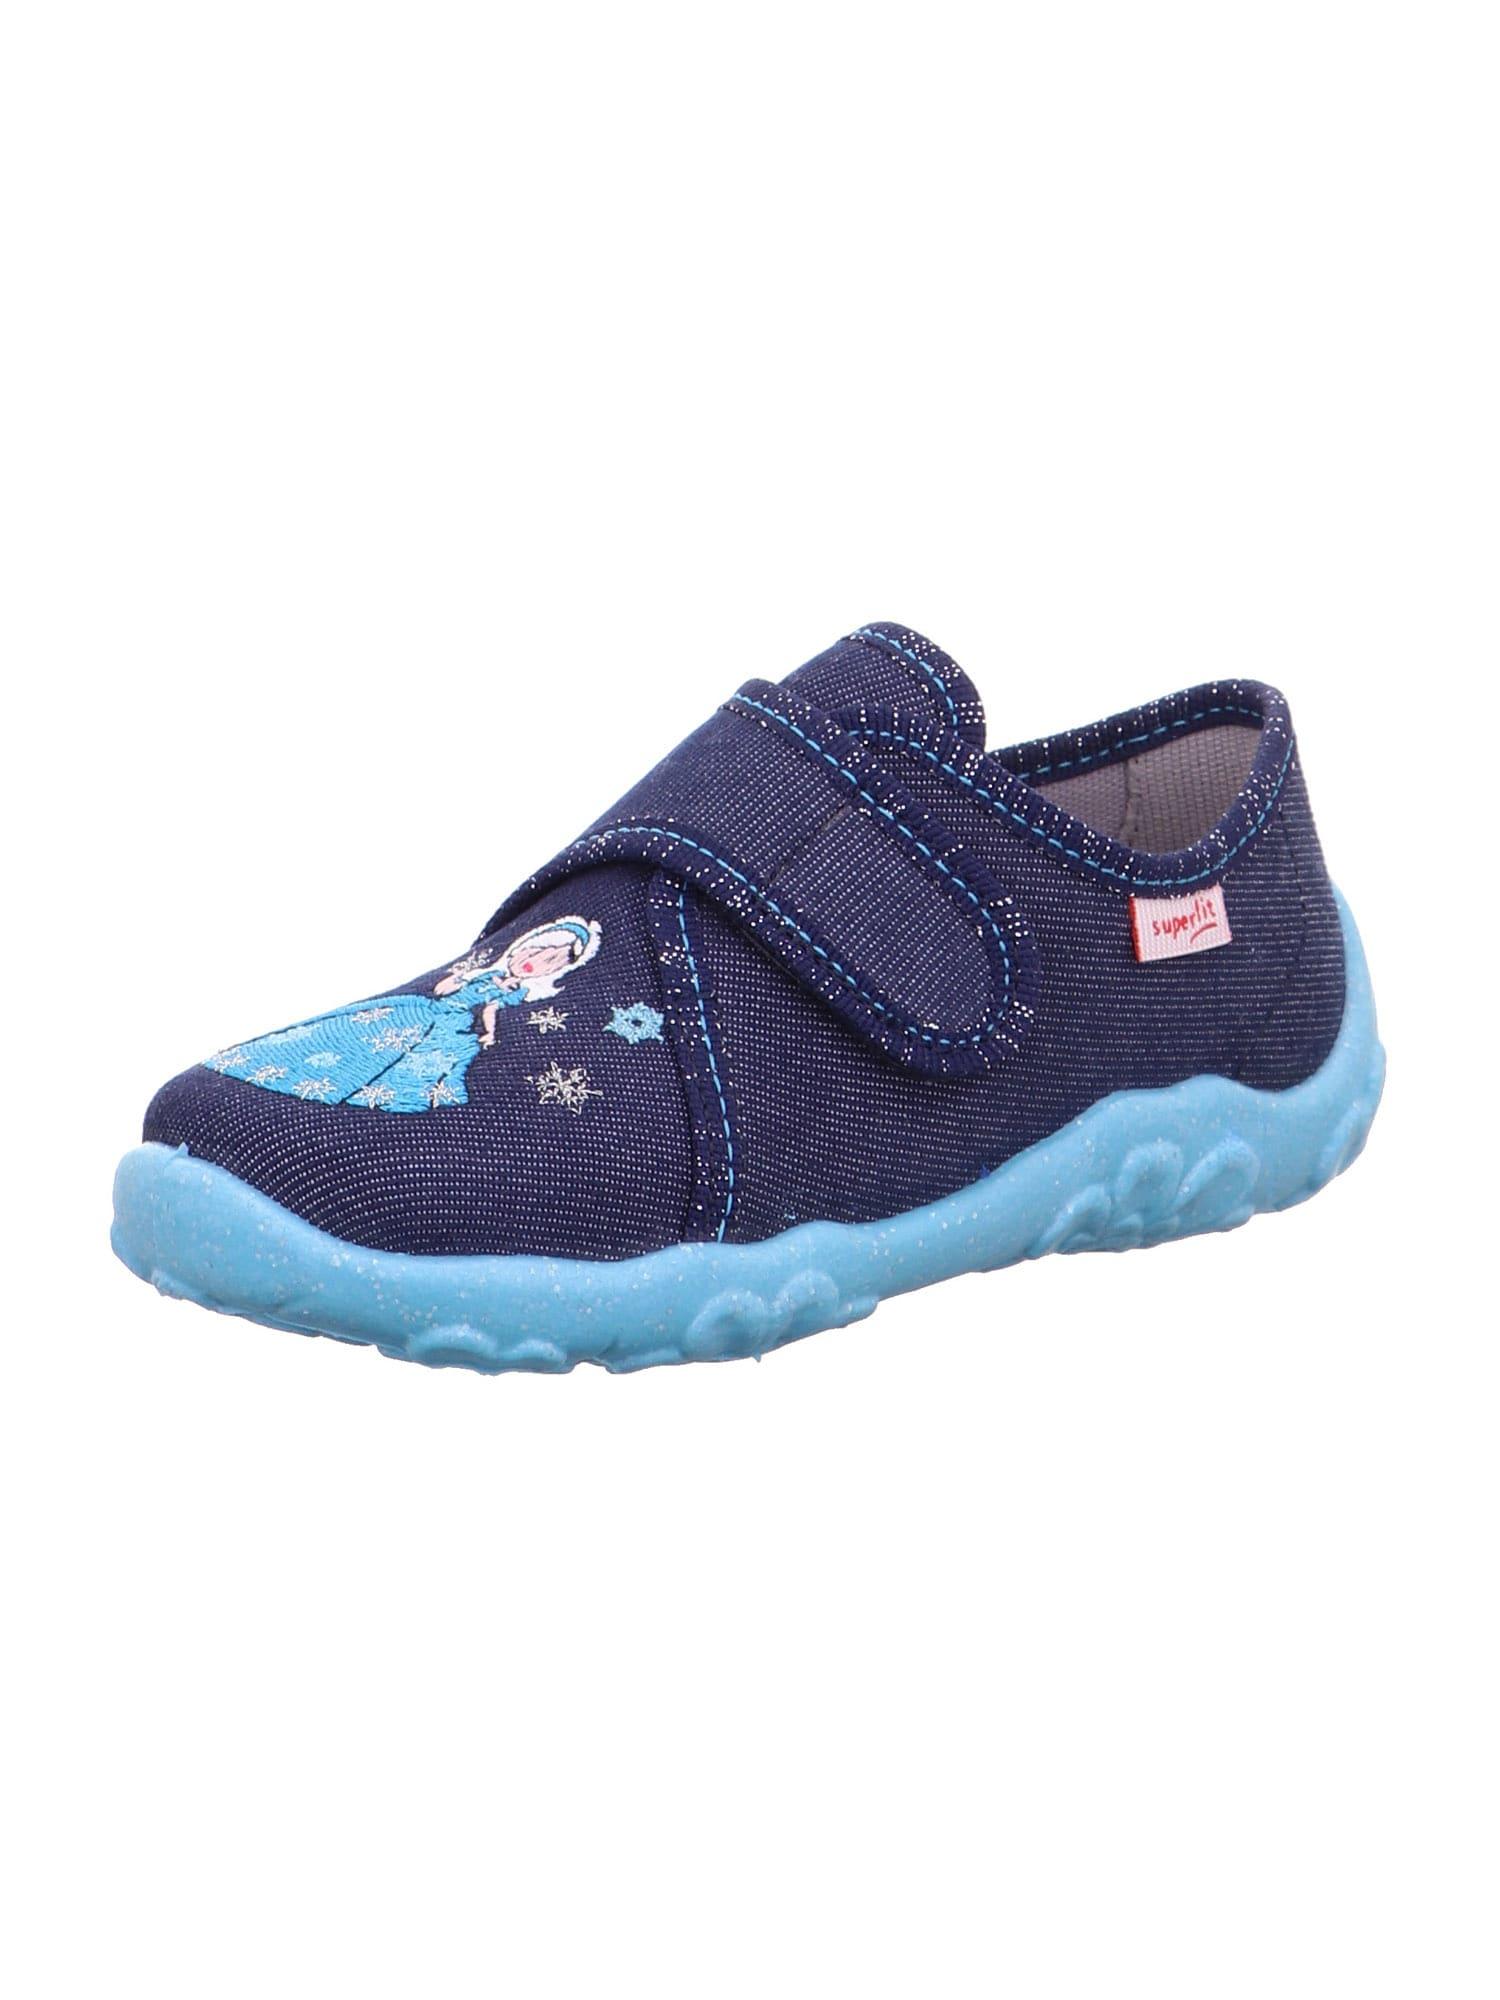 SUPERFIT Pantofle 'BONNY'  noční modrá / světlemodrá / bílá